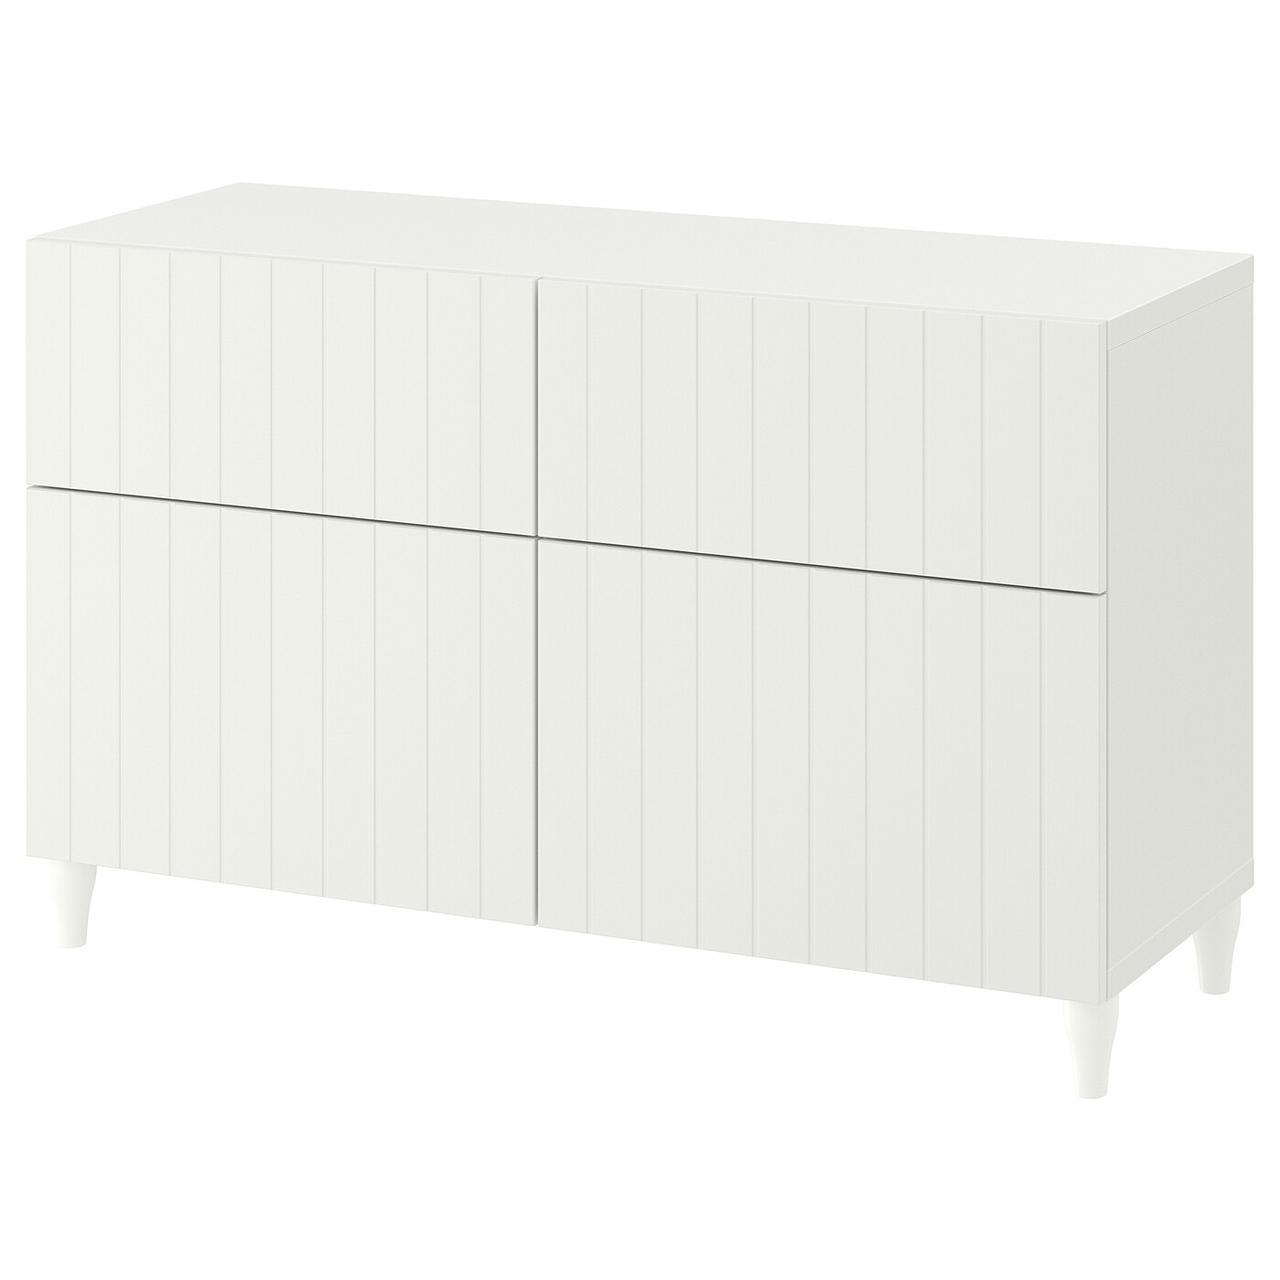 IKEA BESTÅ Комбинация regałowa с двери/ящики с организац, 120x42x74 см